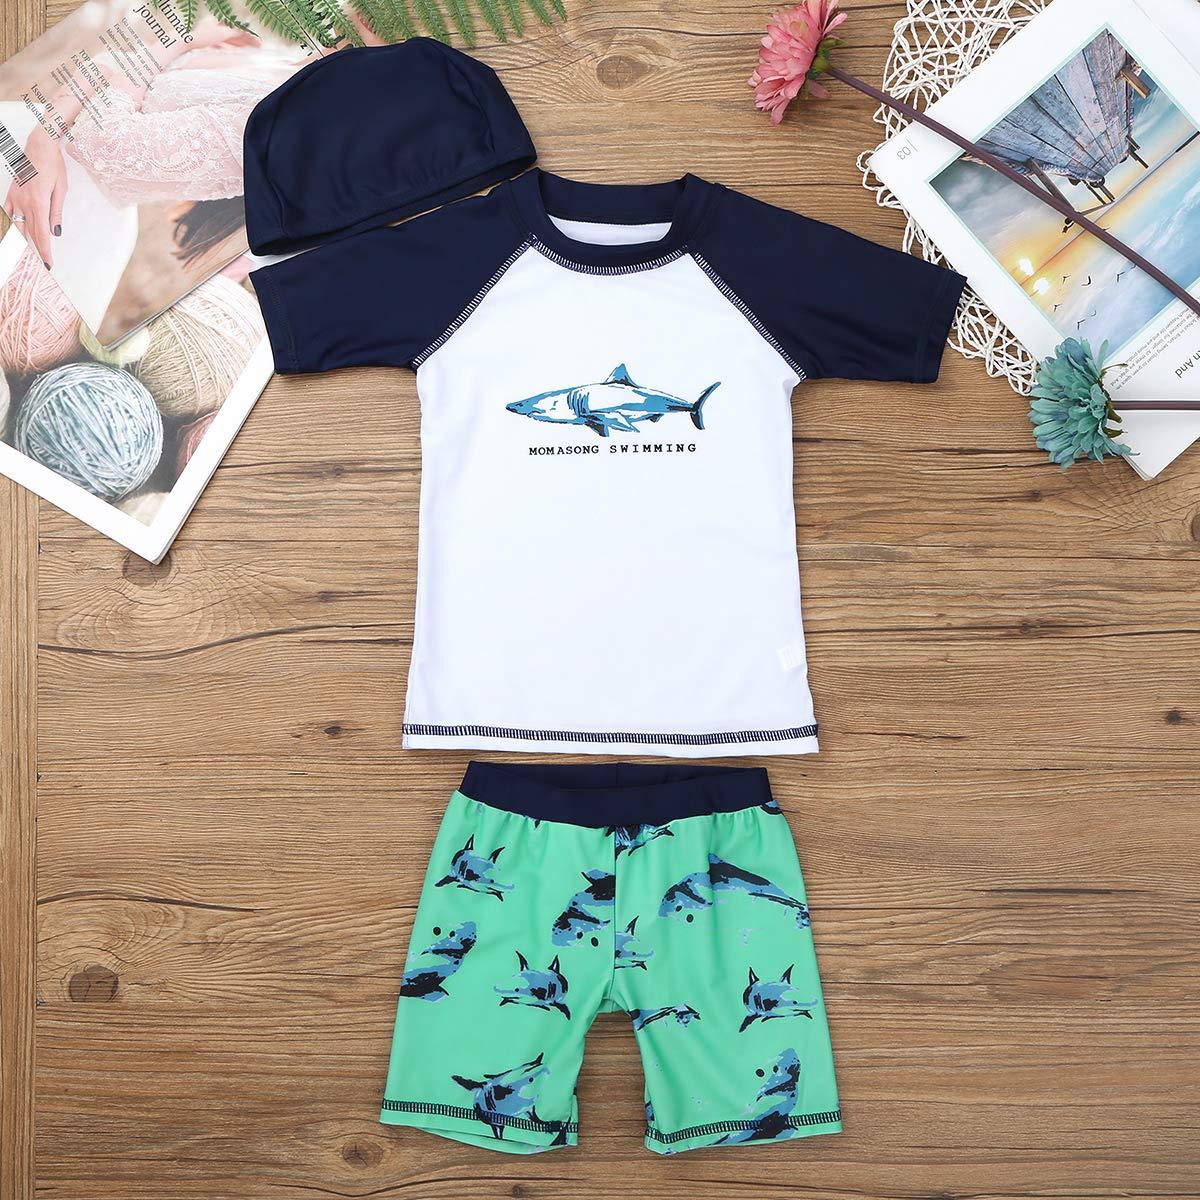 inhzoy Toddler Boys 3-Pieces Swimsuit Set Kid Bathing Suit UPF 50 Beachwear Rash Guard